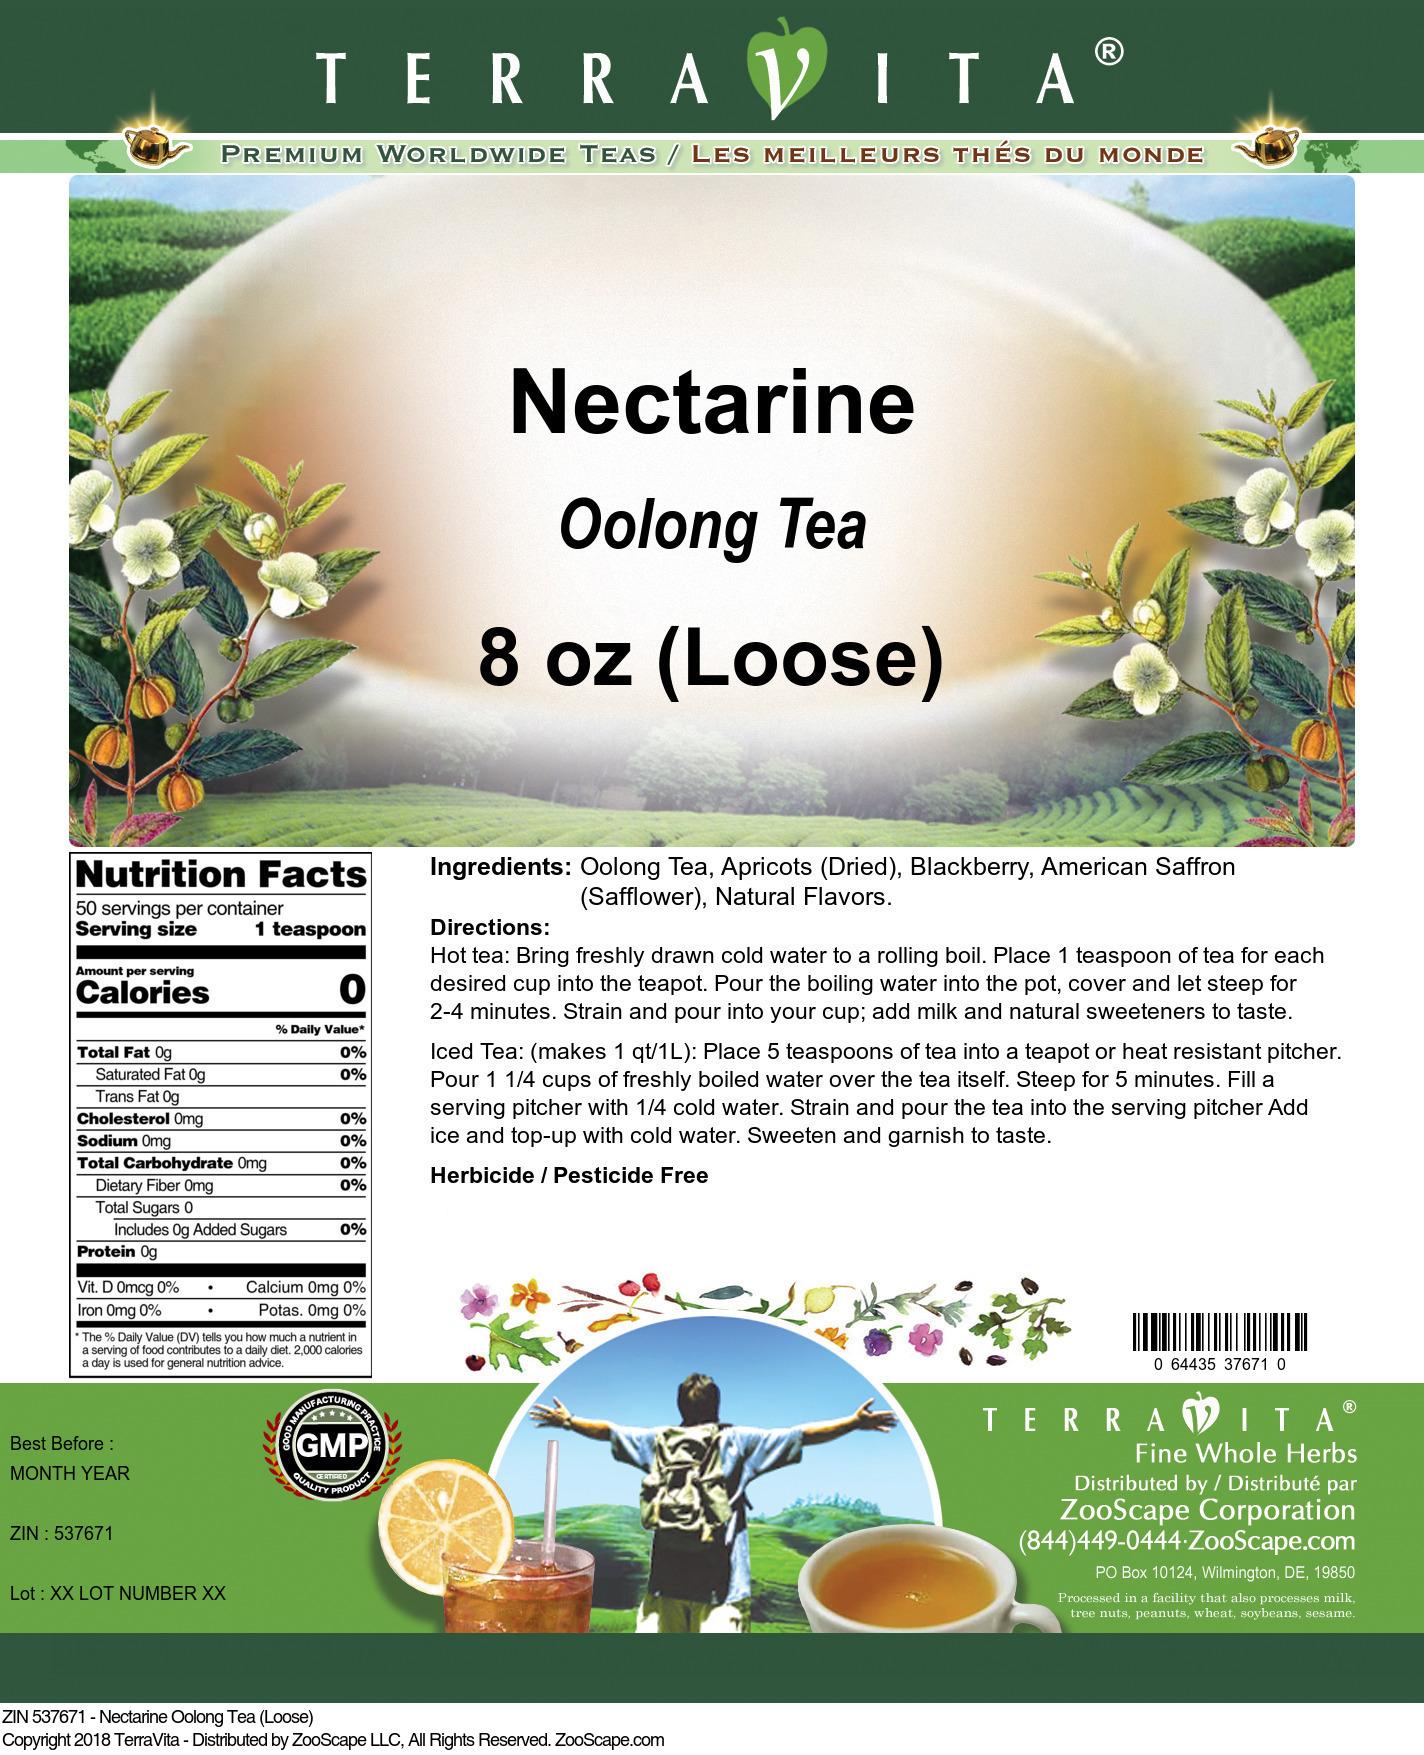 Nectarine Oolong Tea (Loose)